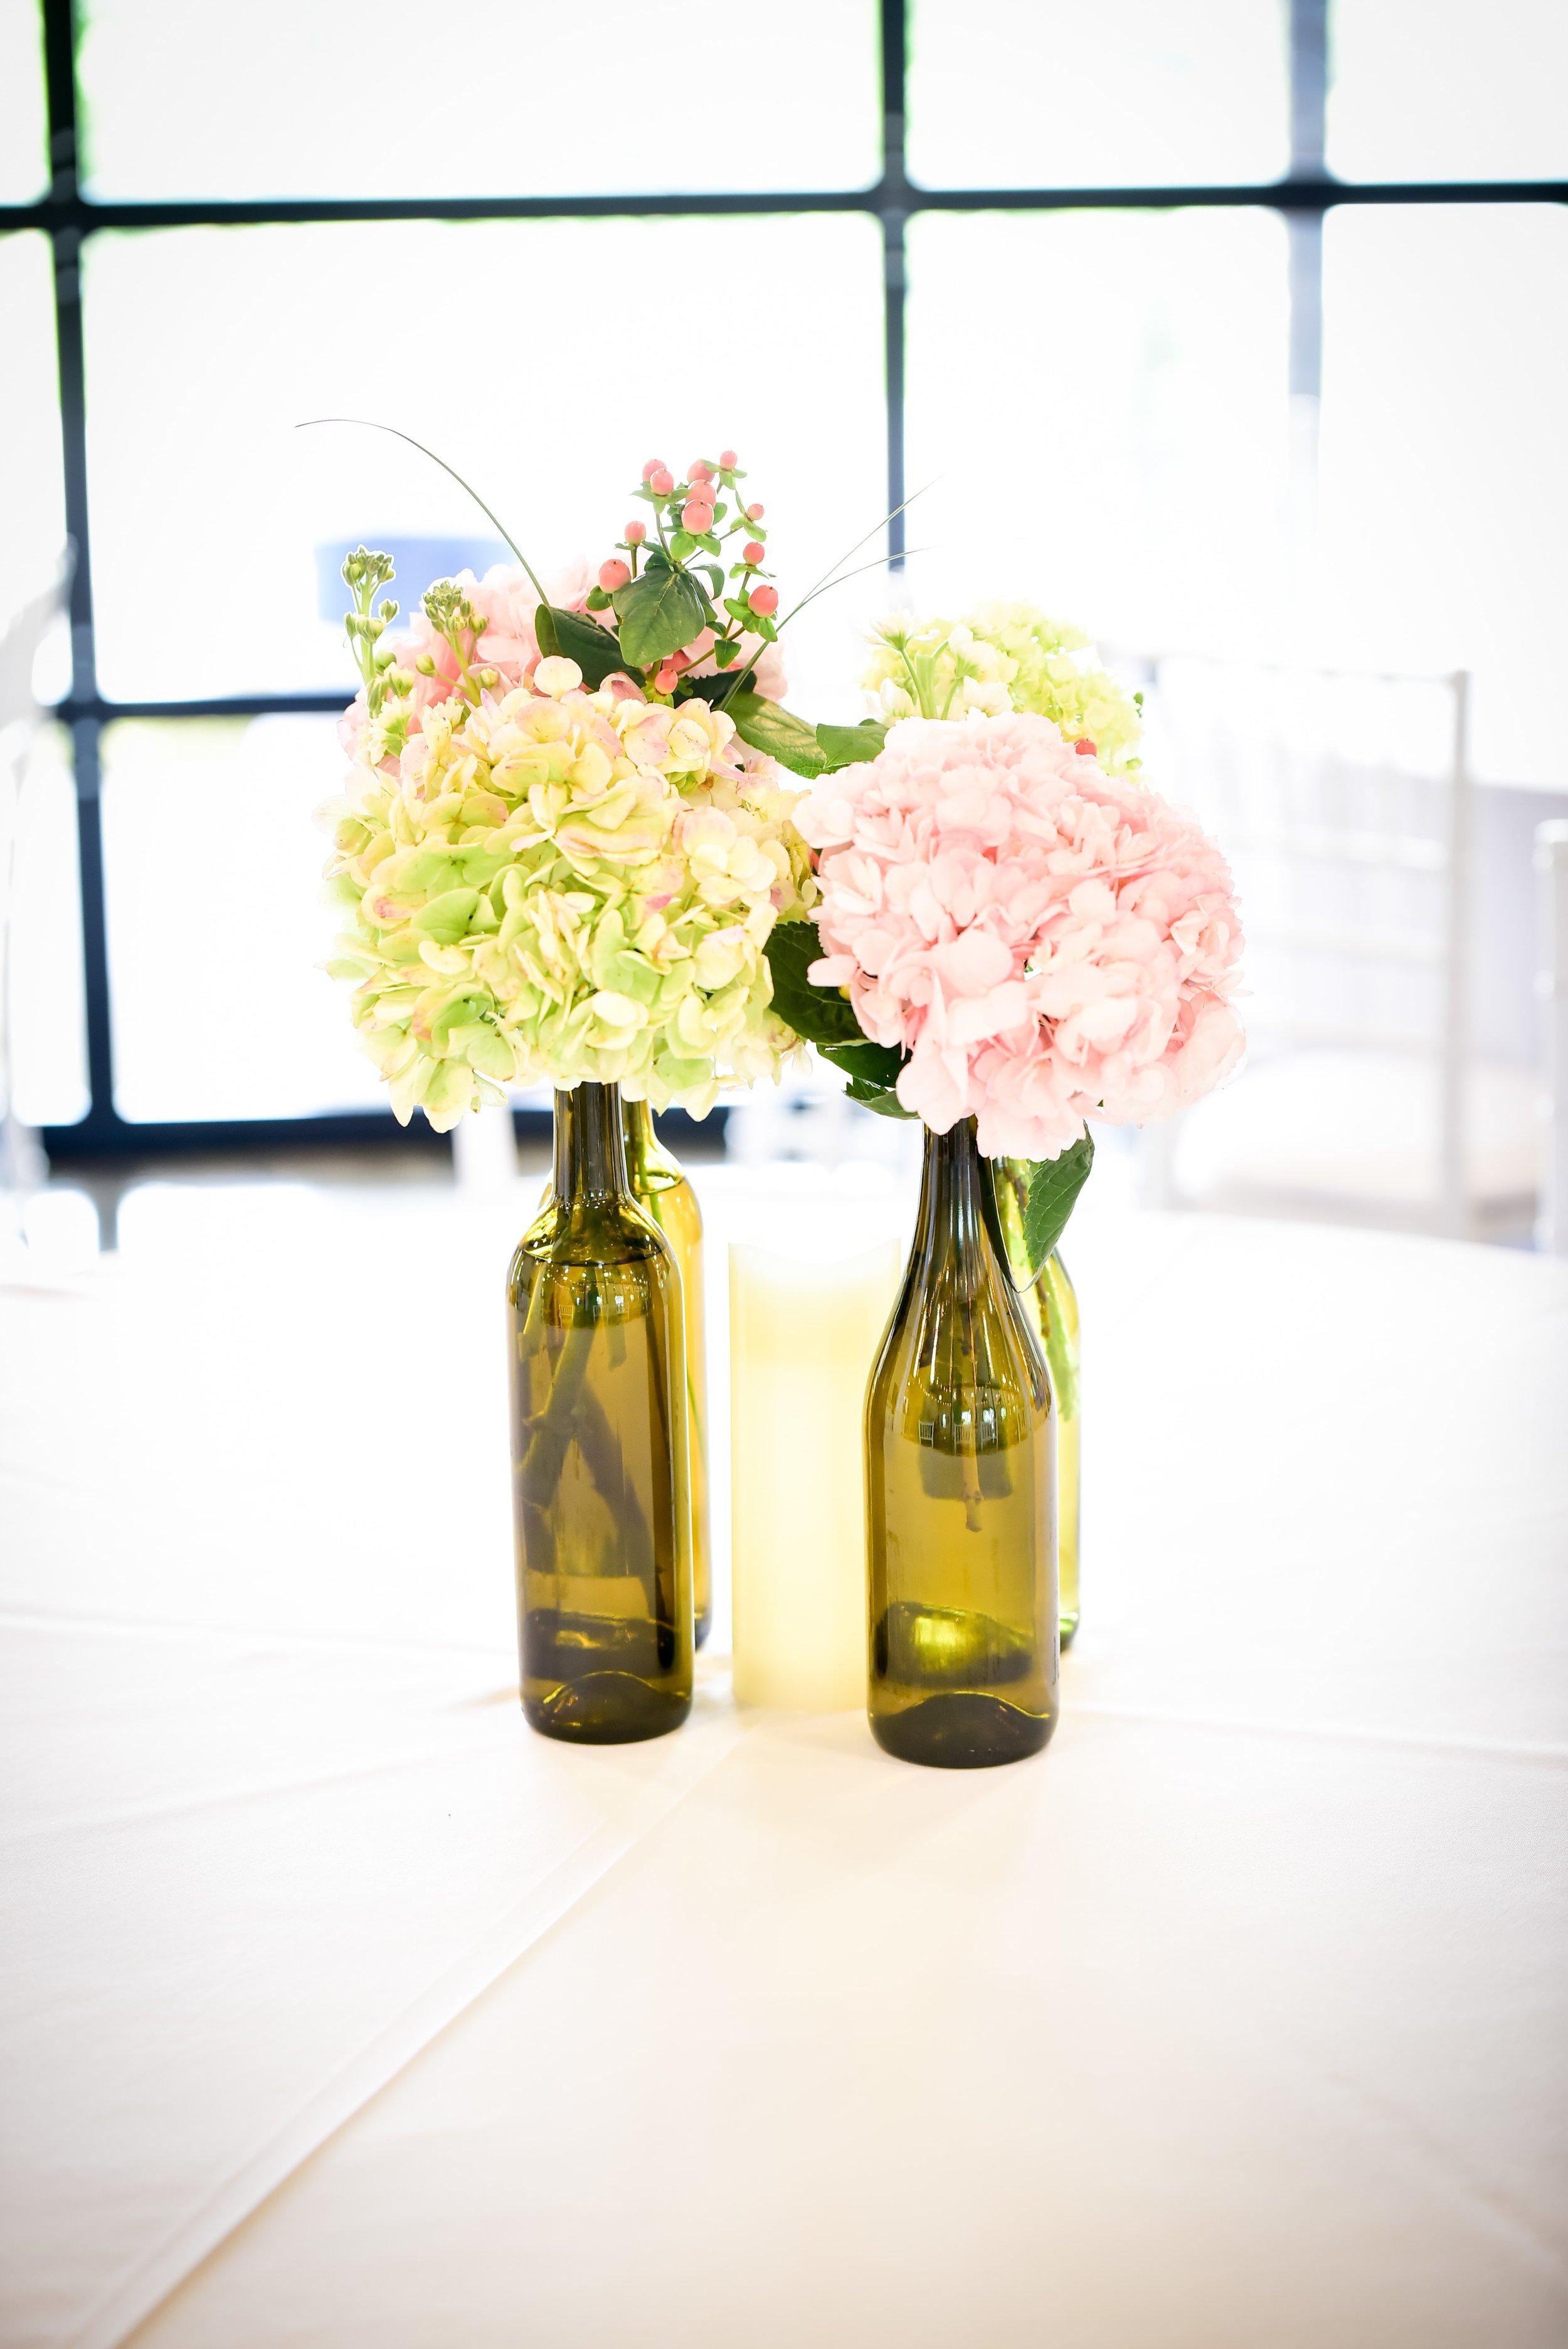 Modern Bright Light White Tulsa Wedding Venue 2-min.jpg